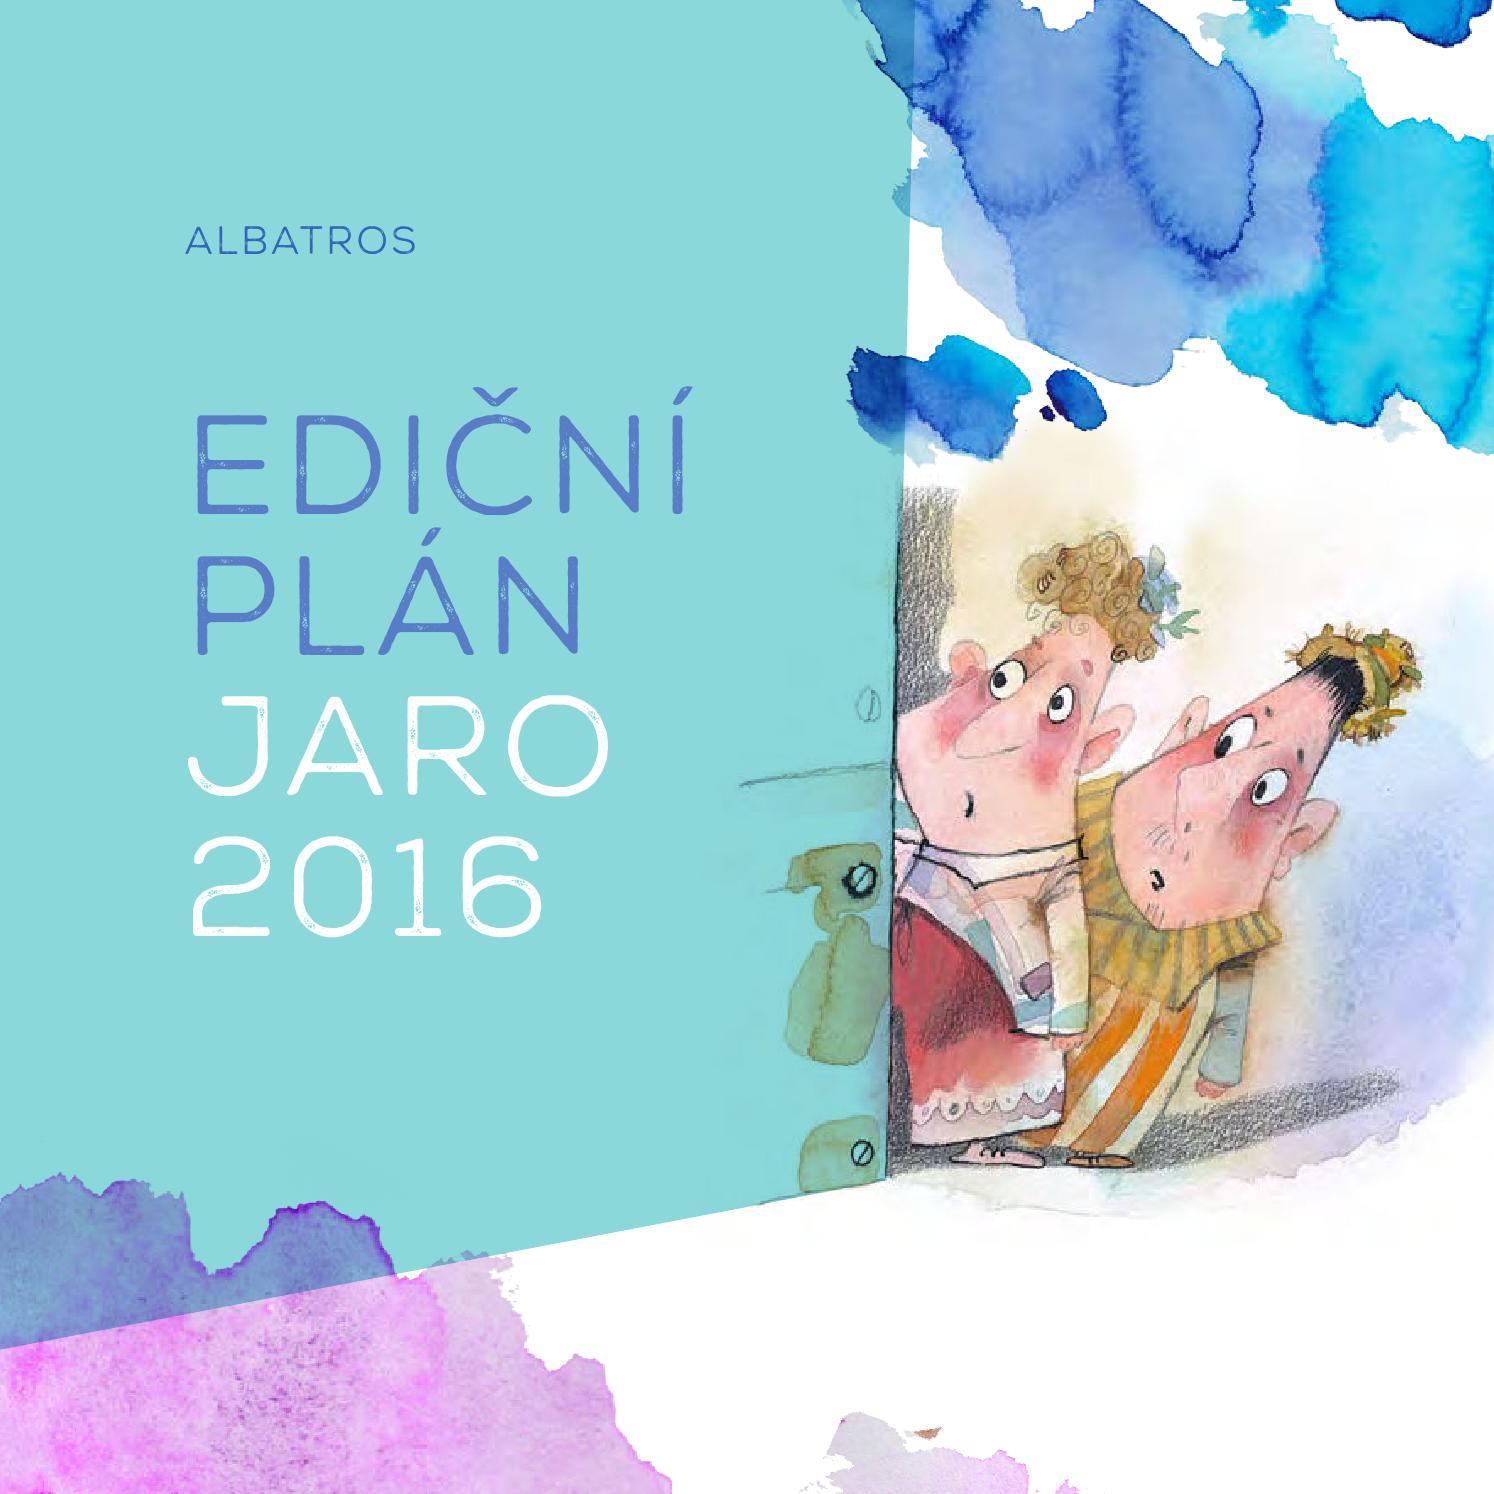 Ediční plán Albatros Jaro 2016 by Albatros Media a.s. - issuu c2d2ec1f4b